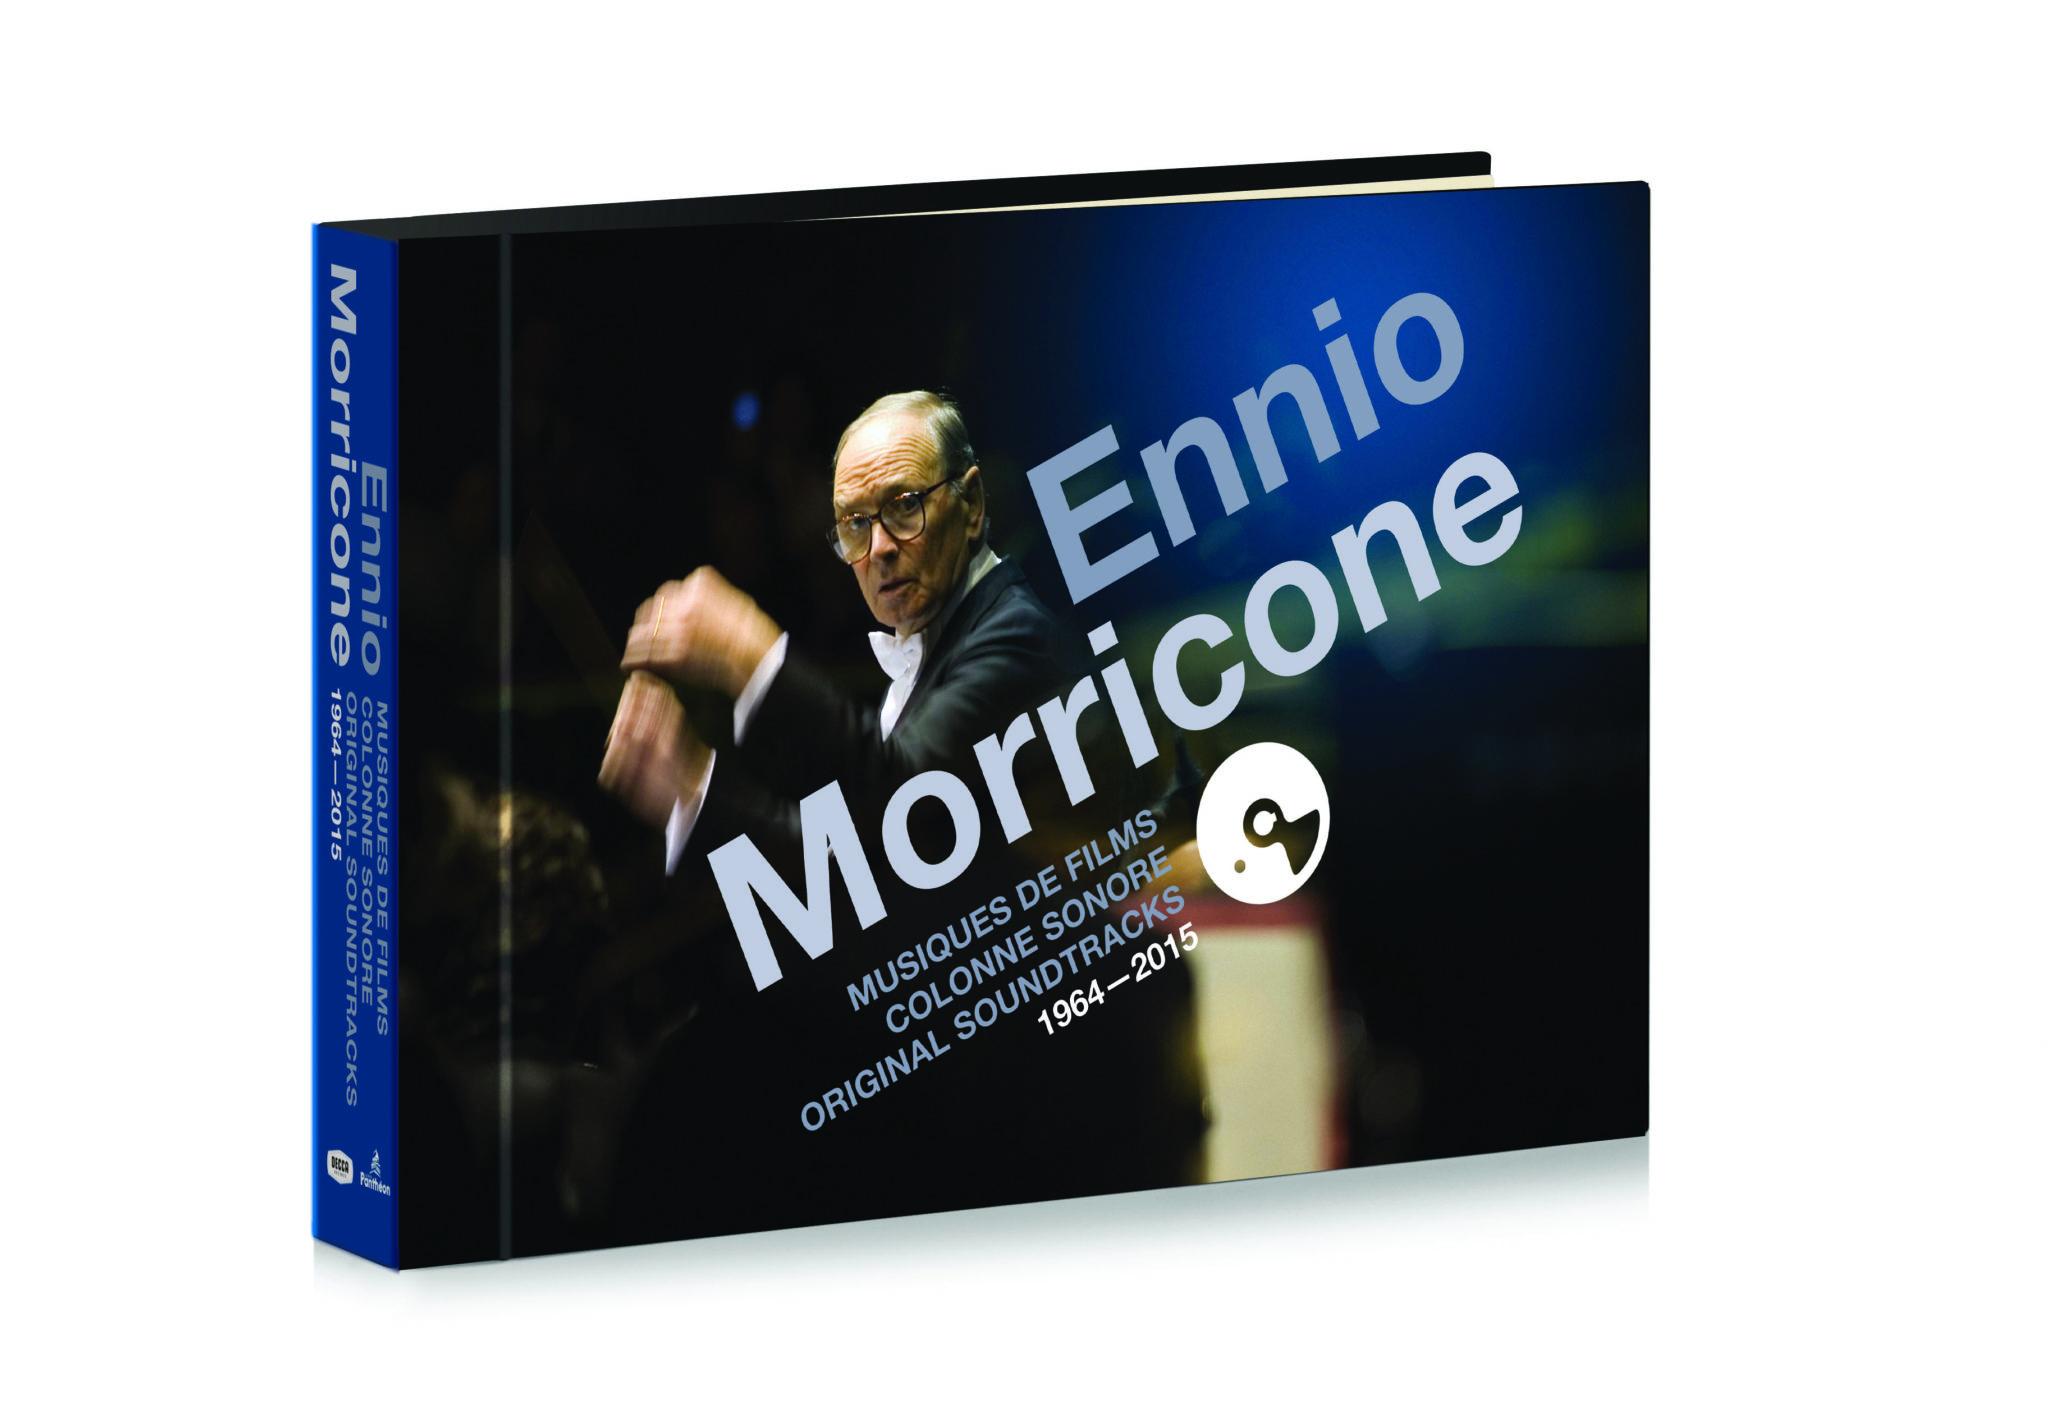 ENNIO MORRICONE_VISUEL_3D